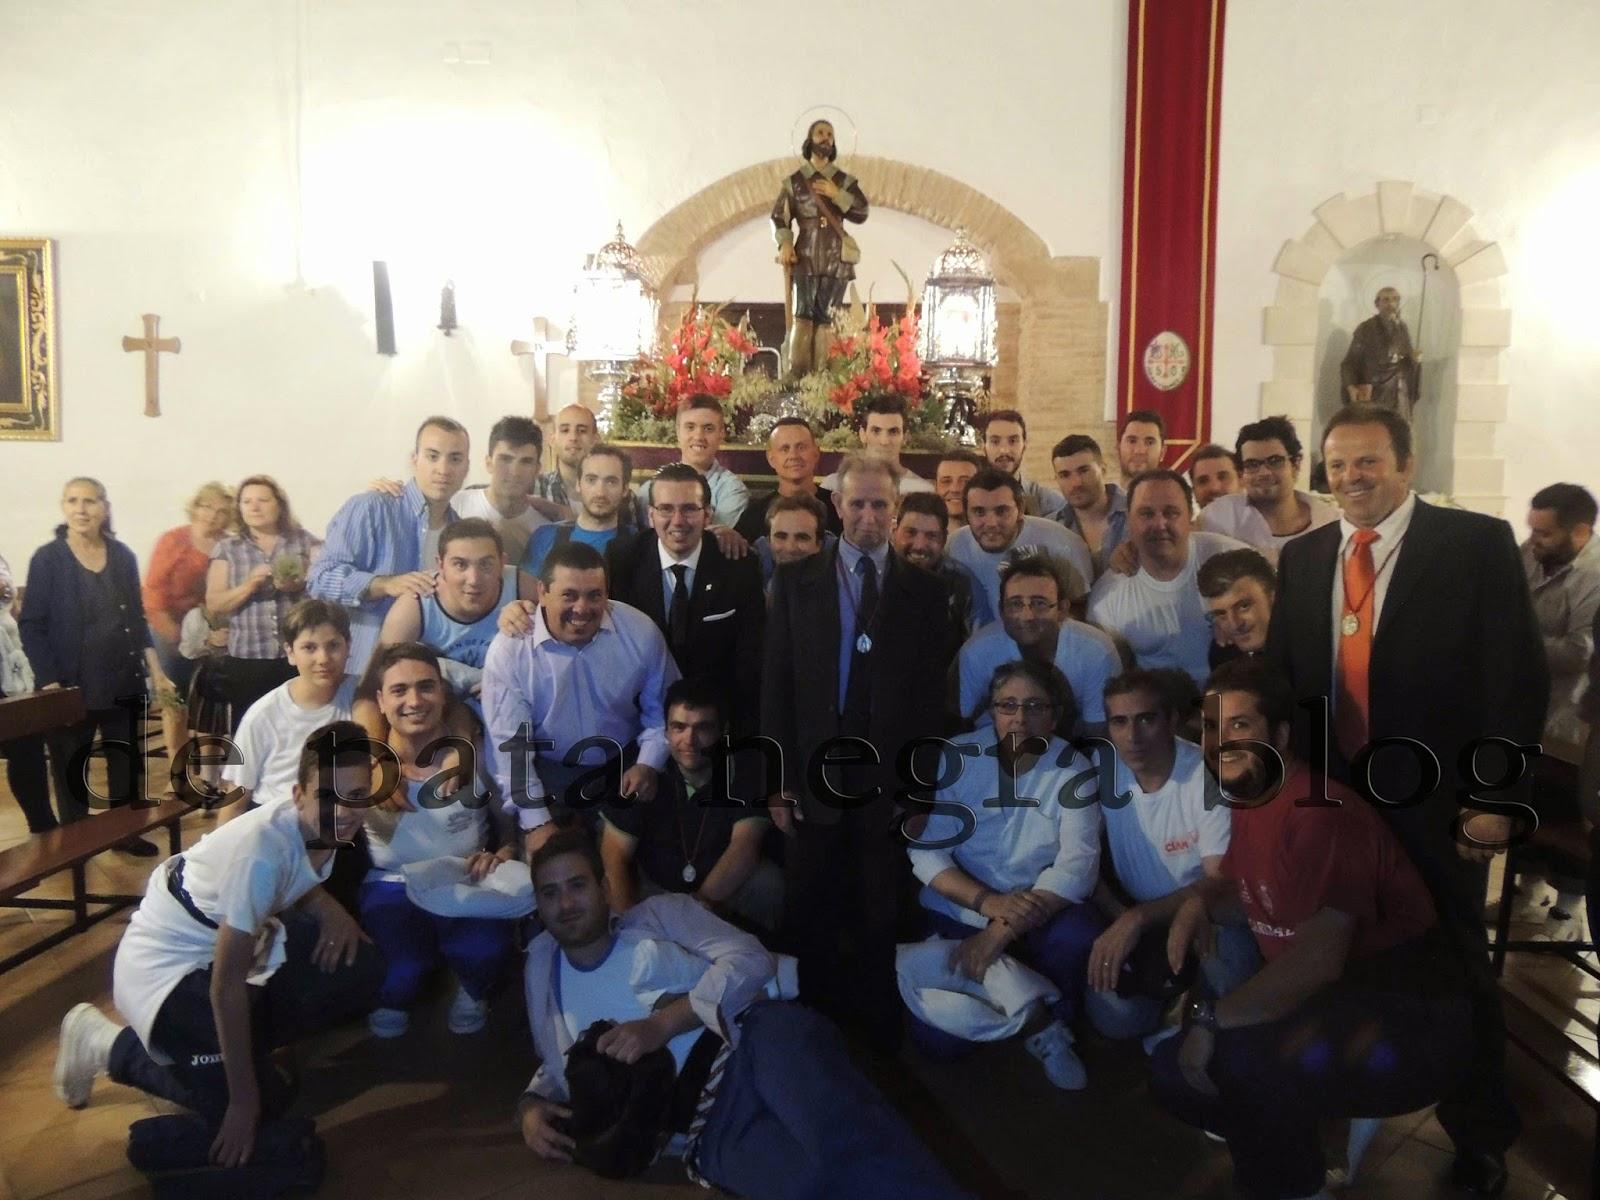 San Isidro, Almagro 2014